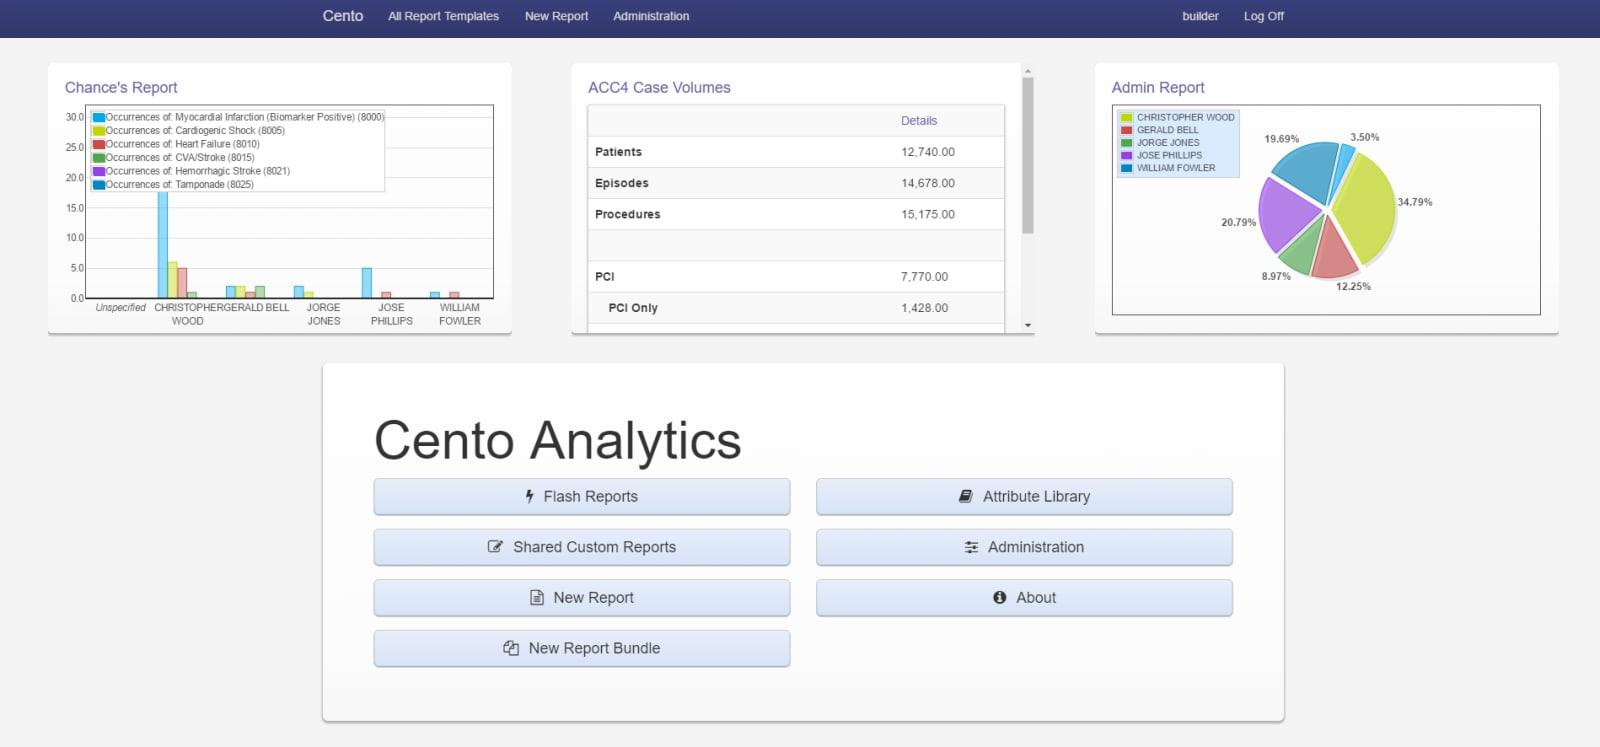 Cento Analytics Dashboard